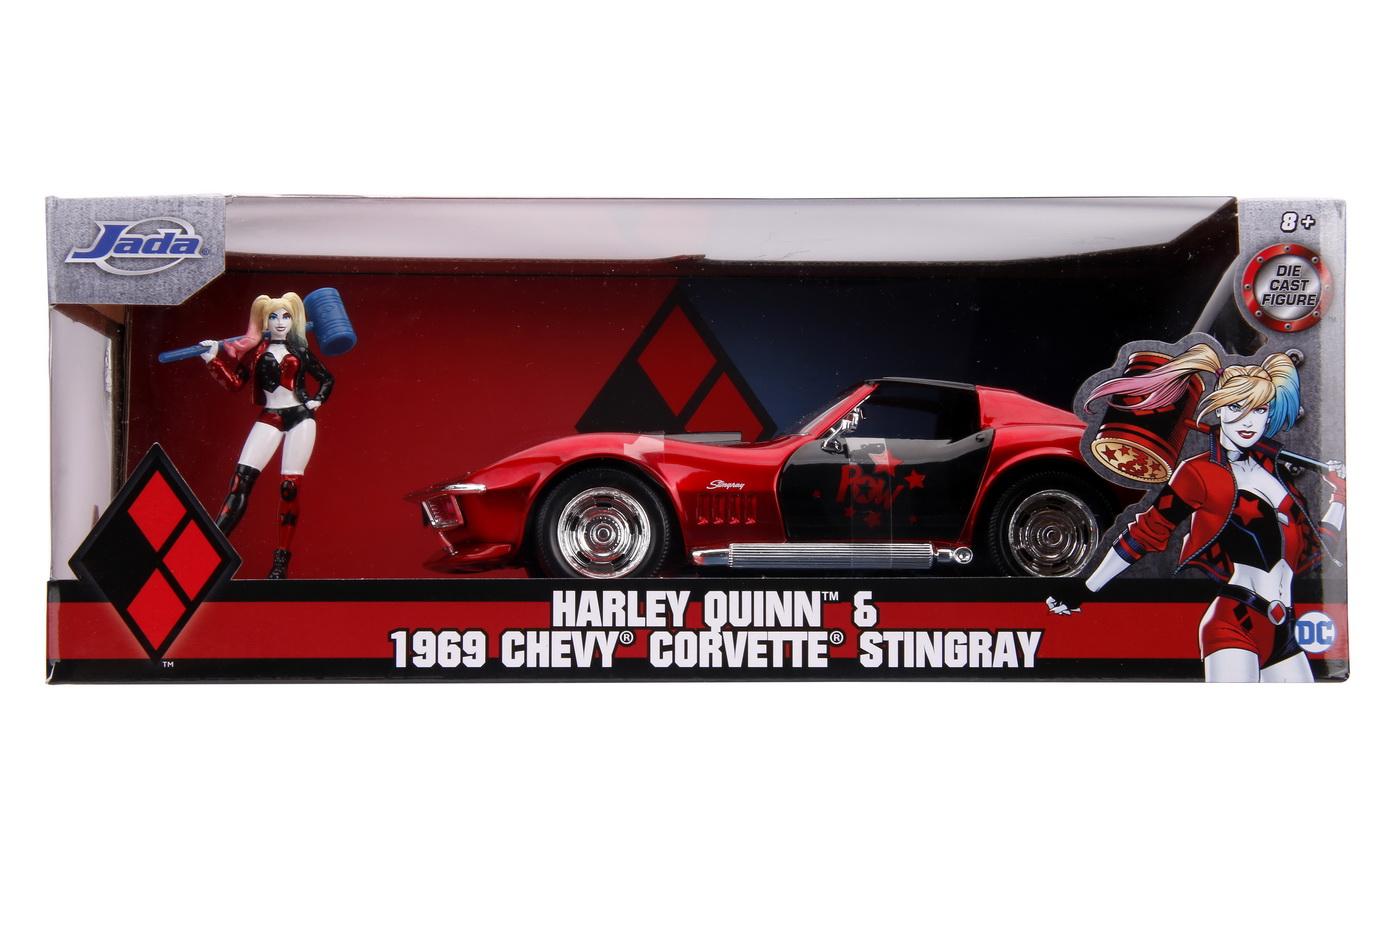 Masinuta din metal harley quinn 1969 chevy corvette scara 1:24